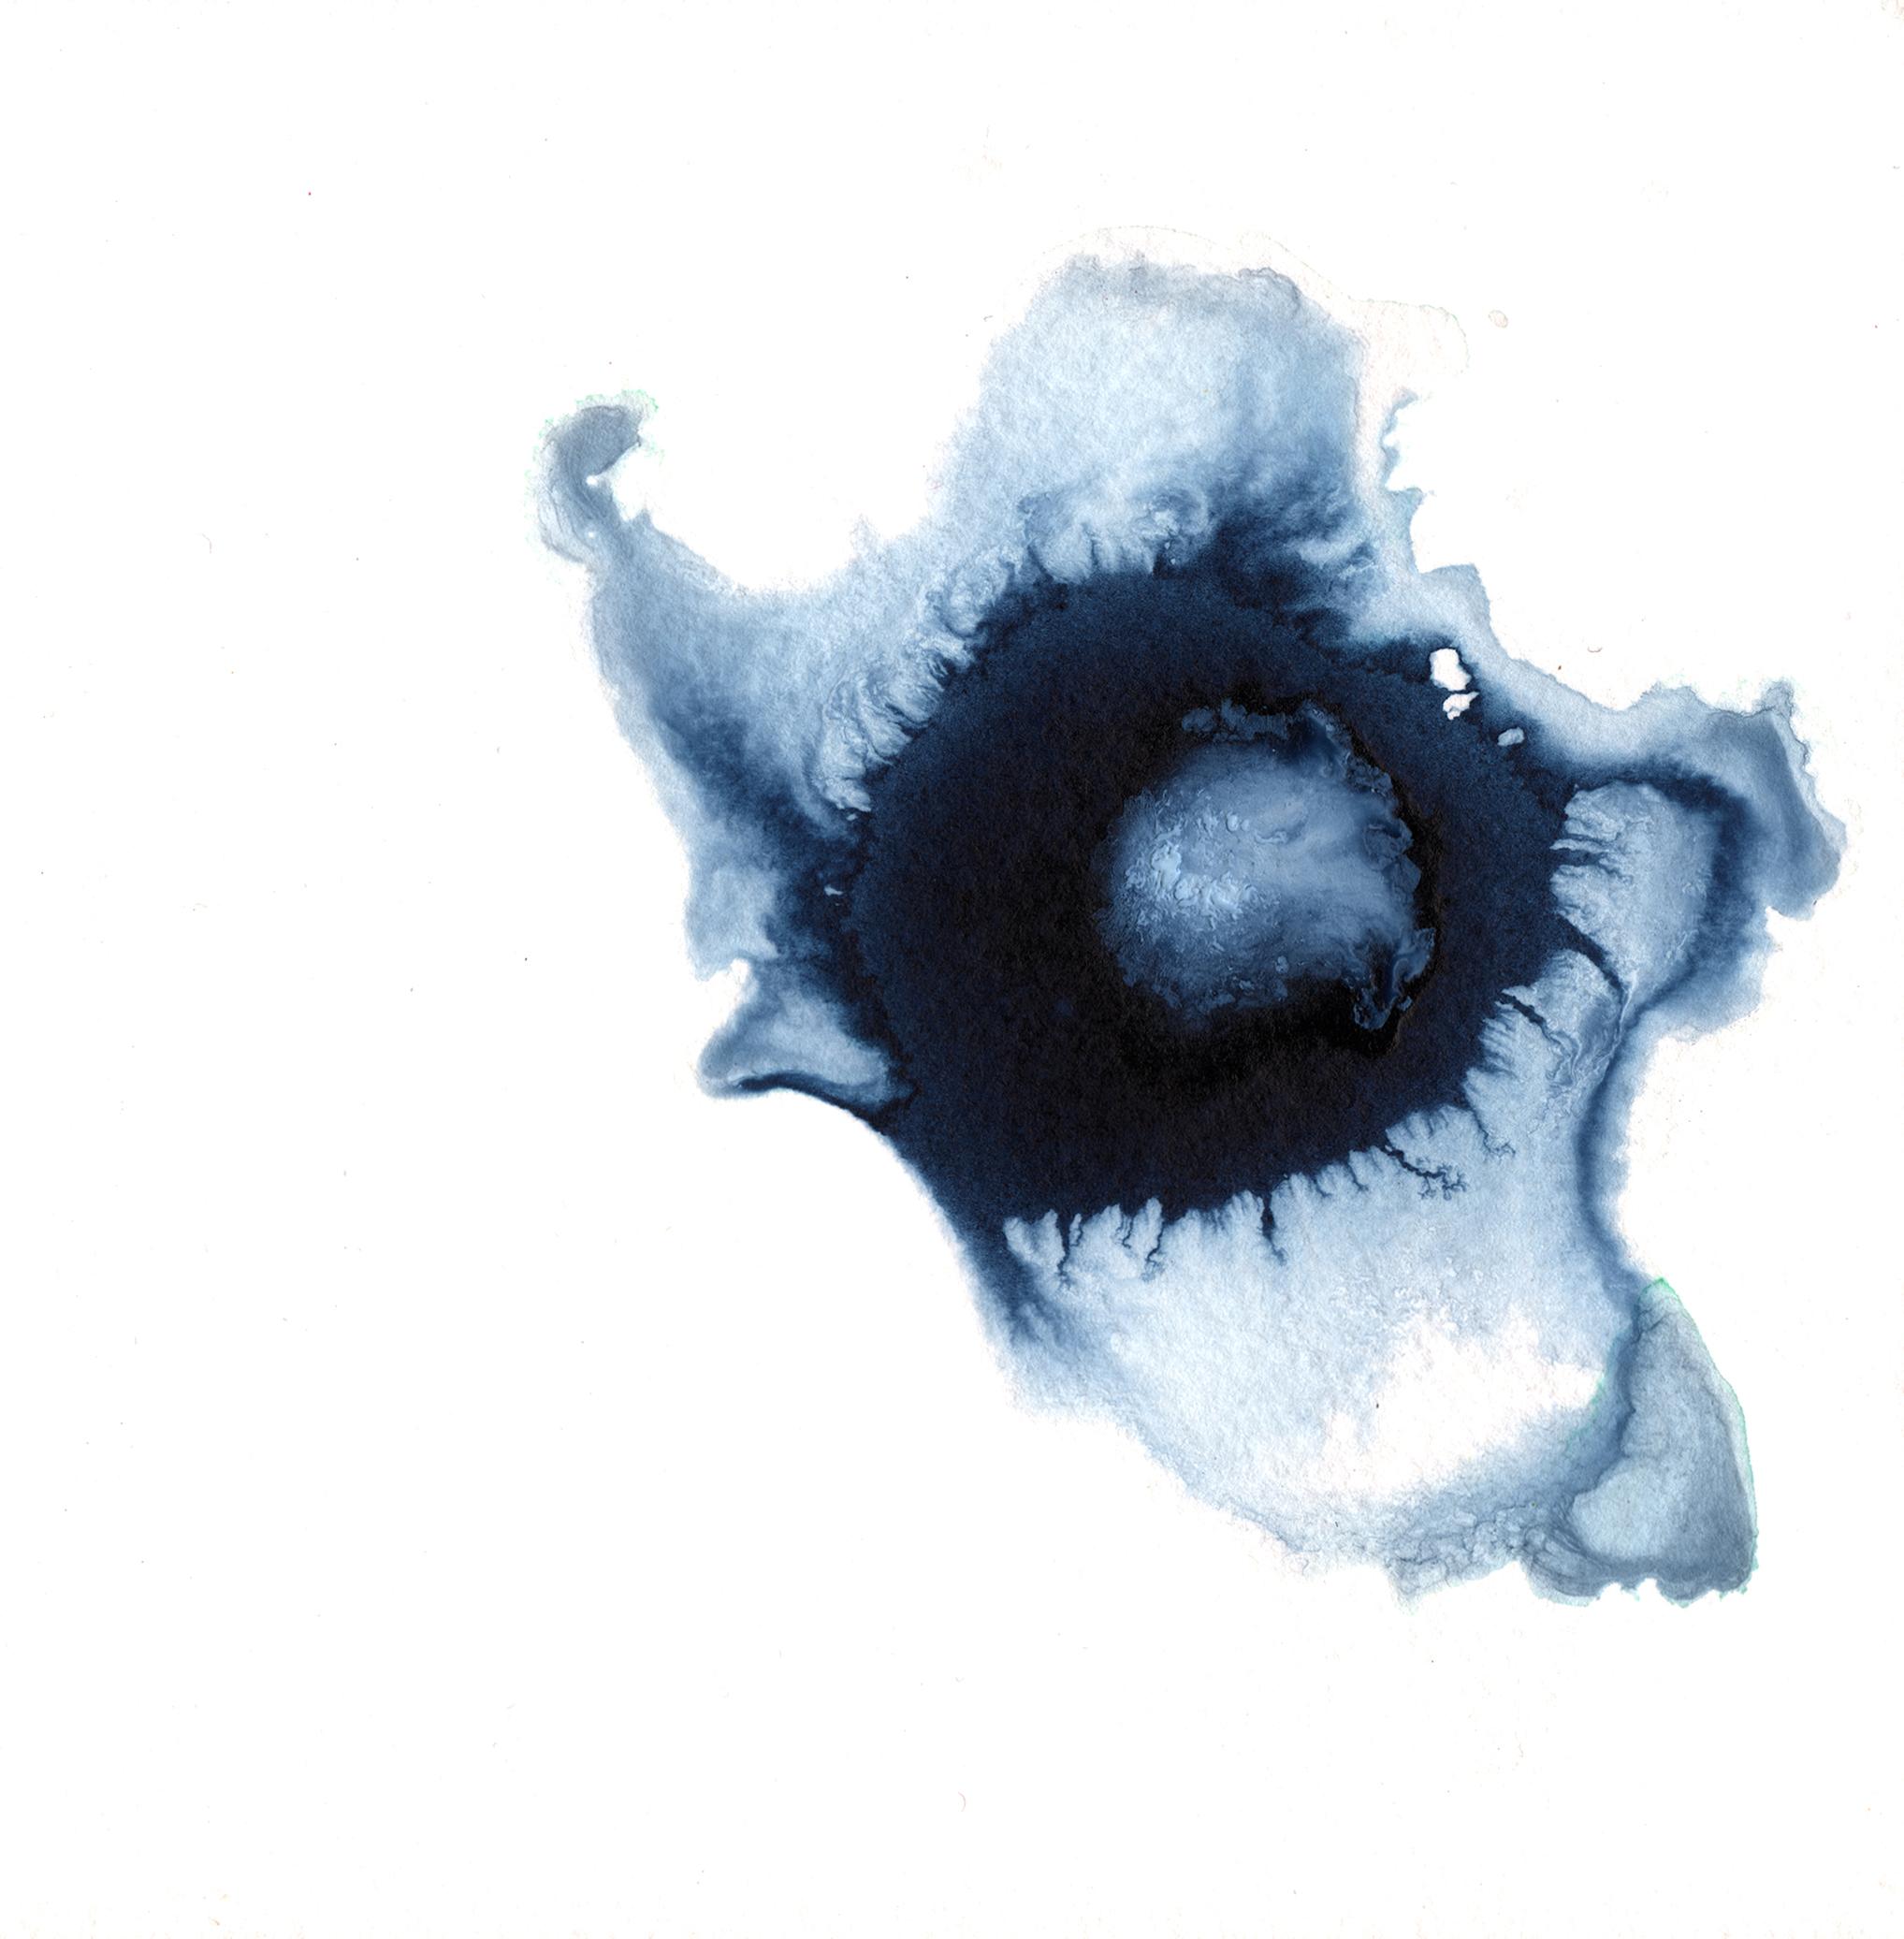 295.Anemone.11.30.14.jpg